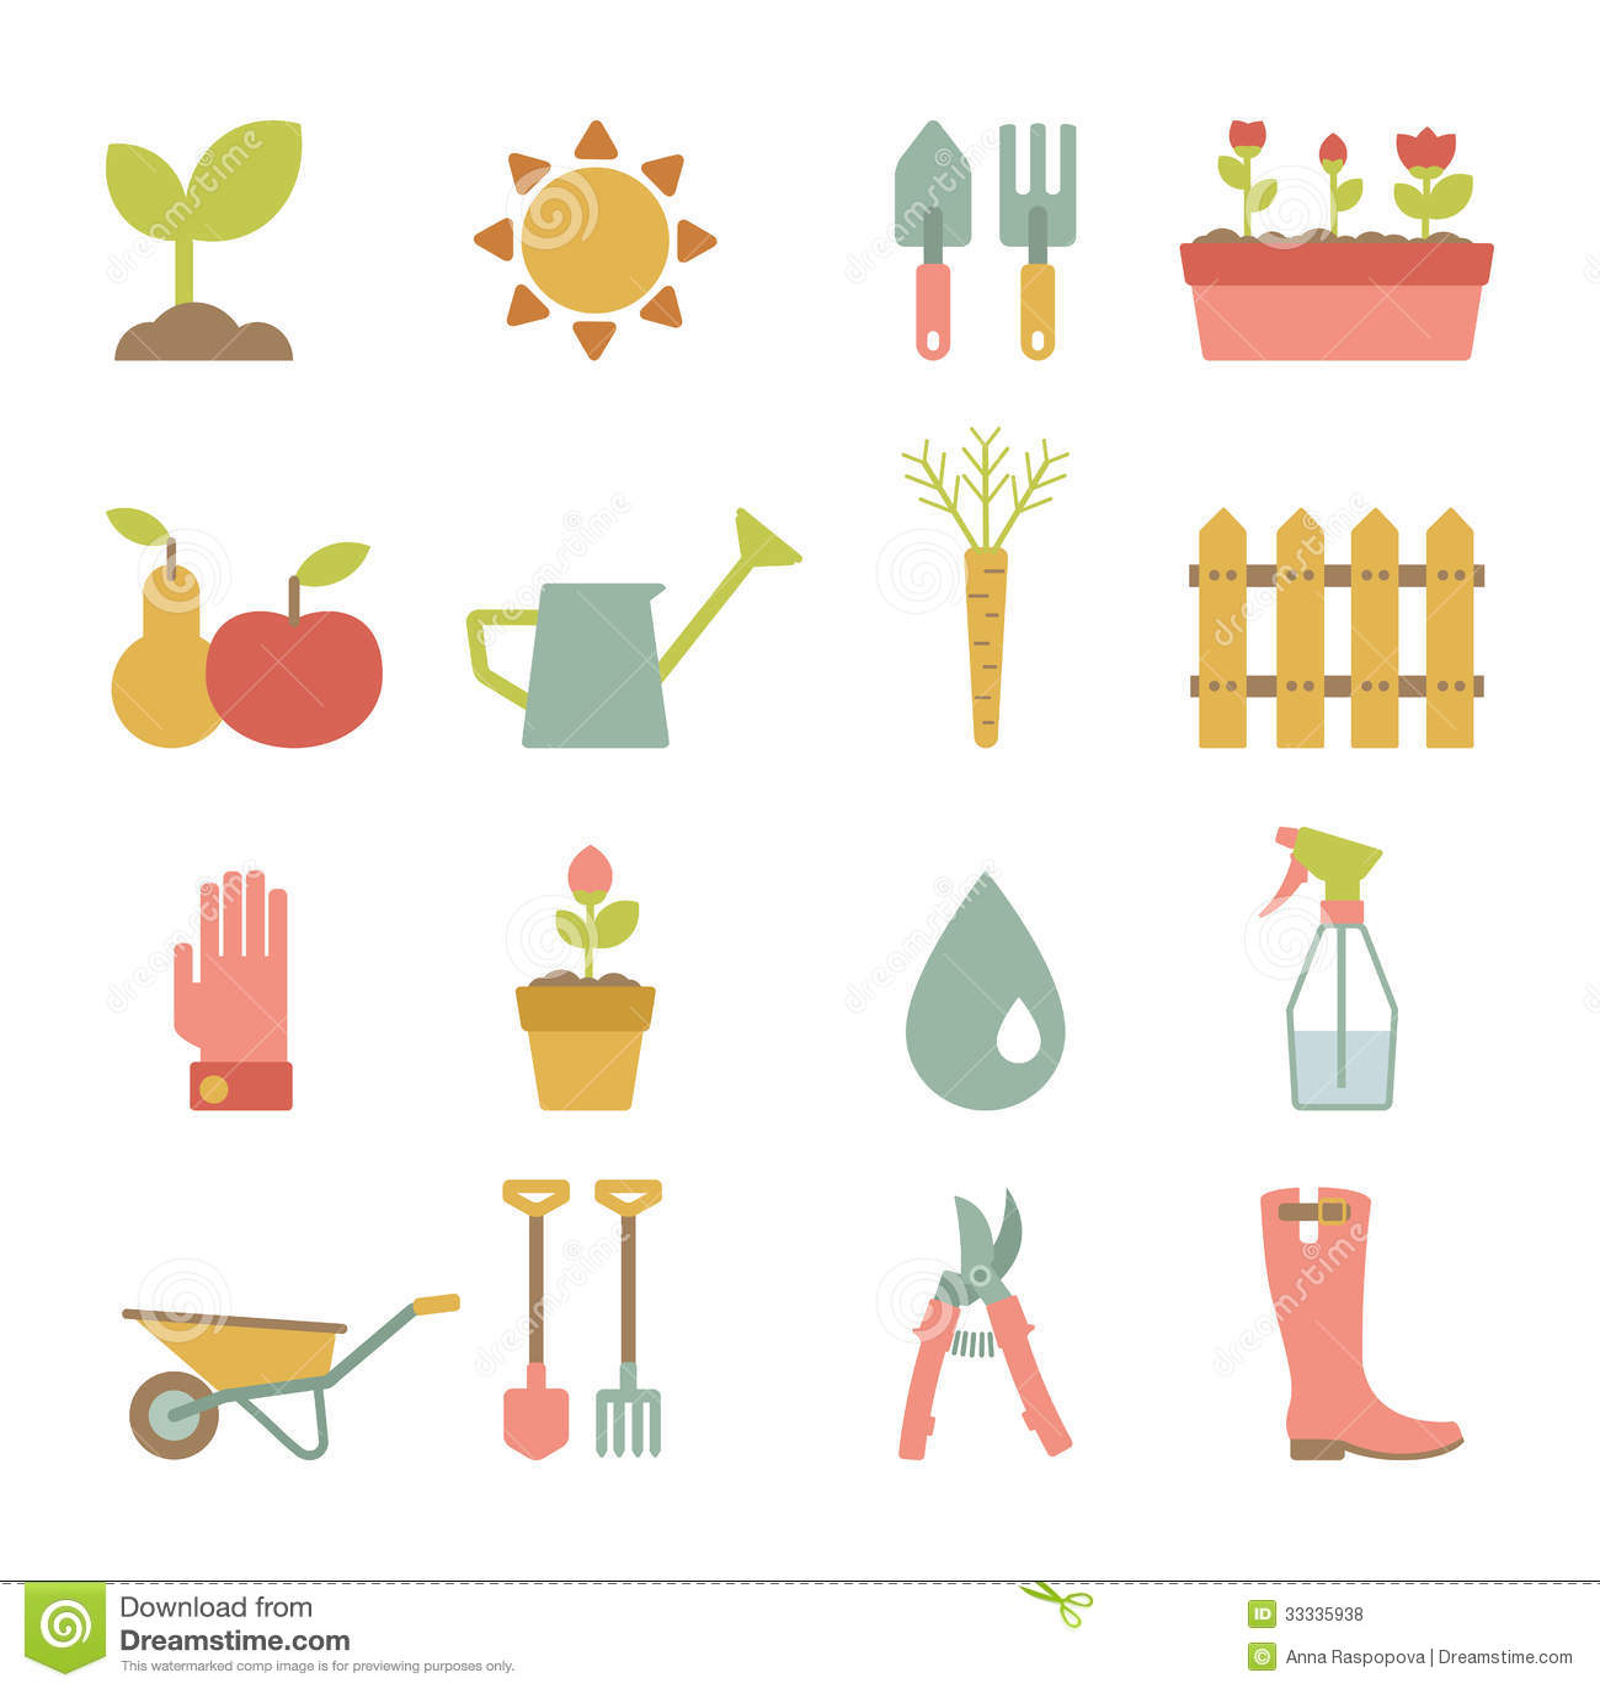 Gardening Icons Royalty Free Stock Photos - Image: 33335938